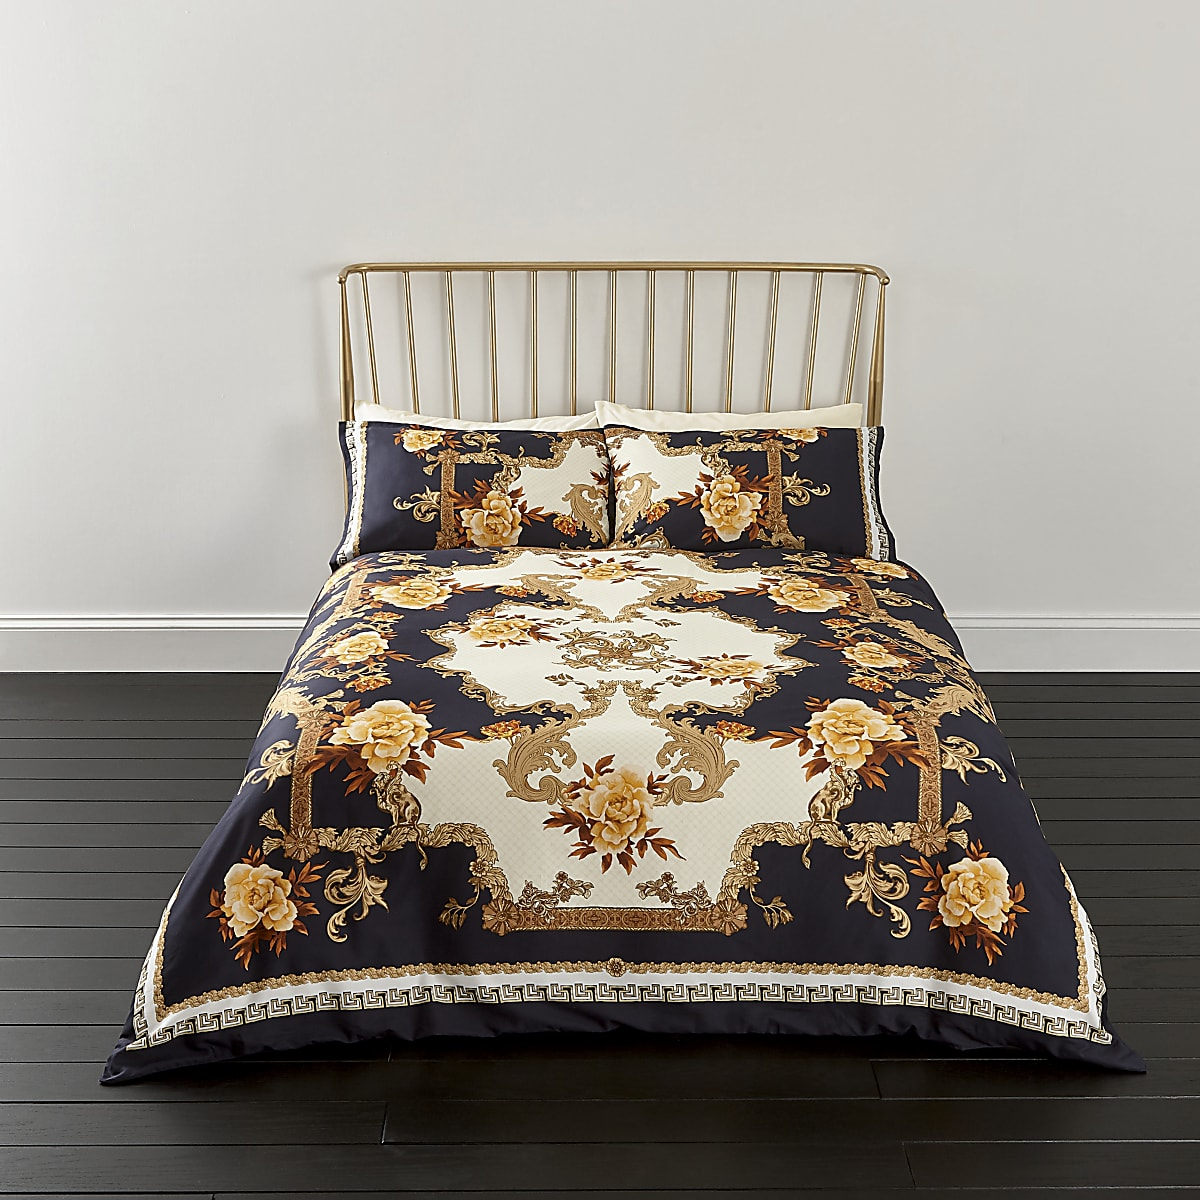 Blauw kingsize dekbedset met elegante print